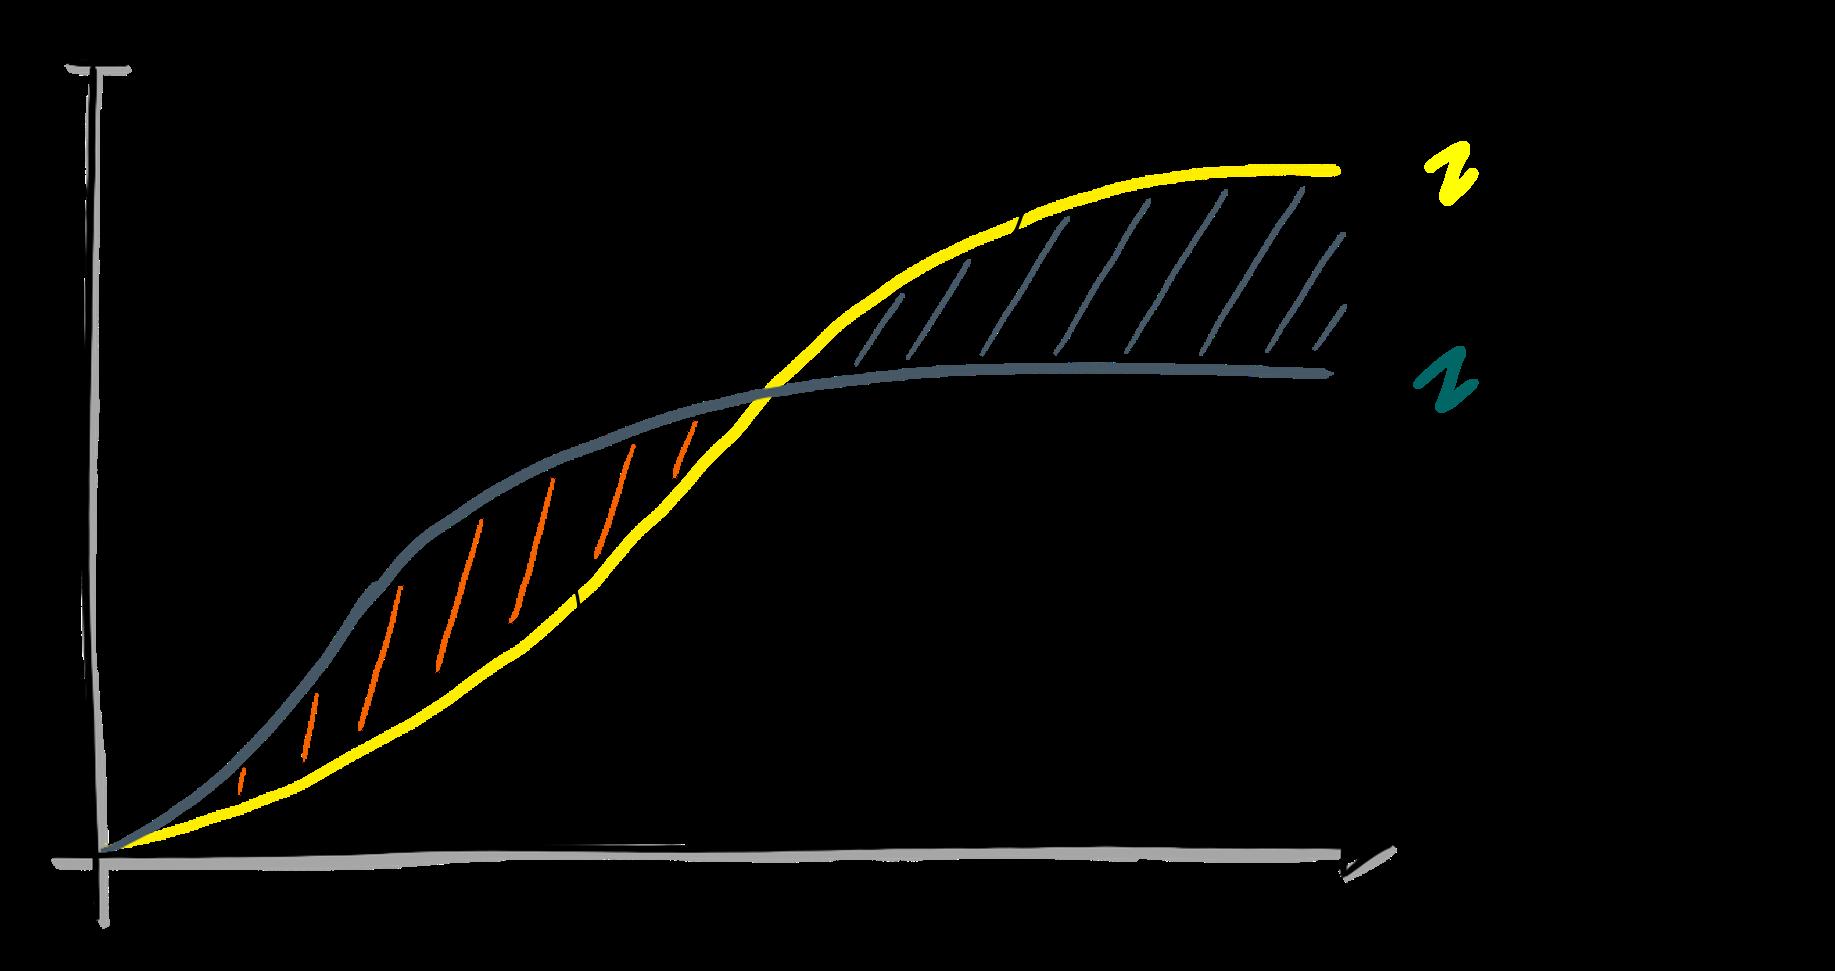 modularisierung-produktplanung-frontloading